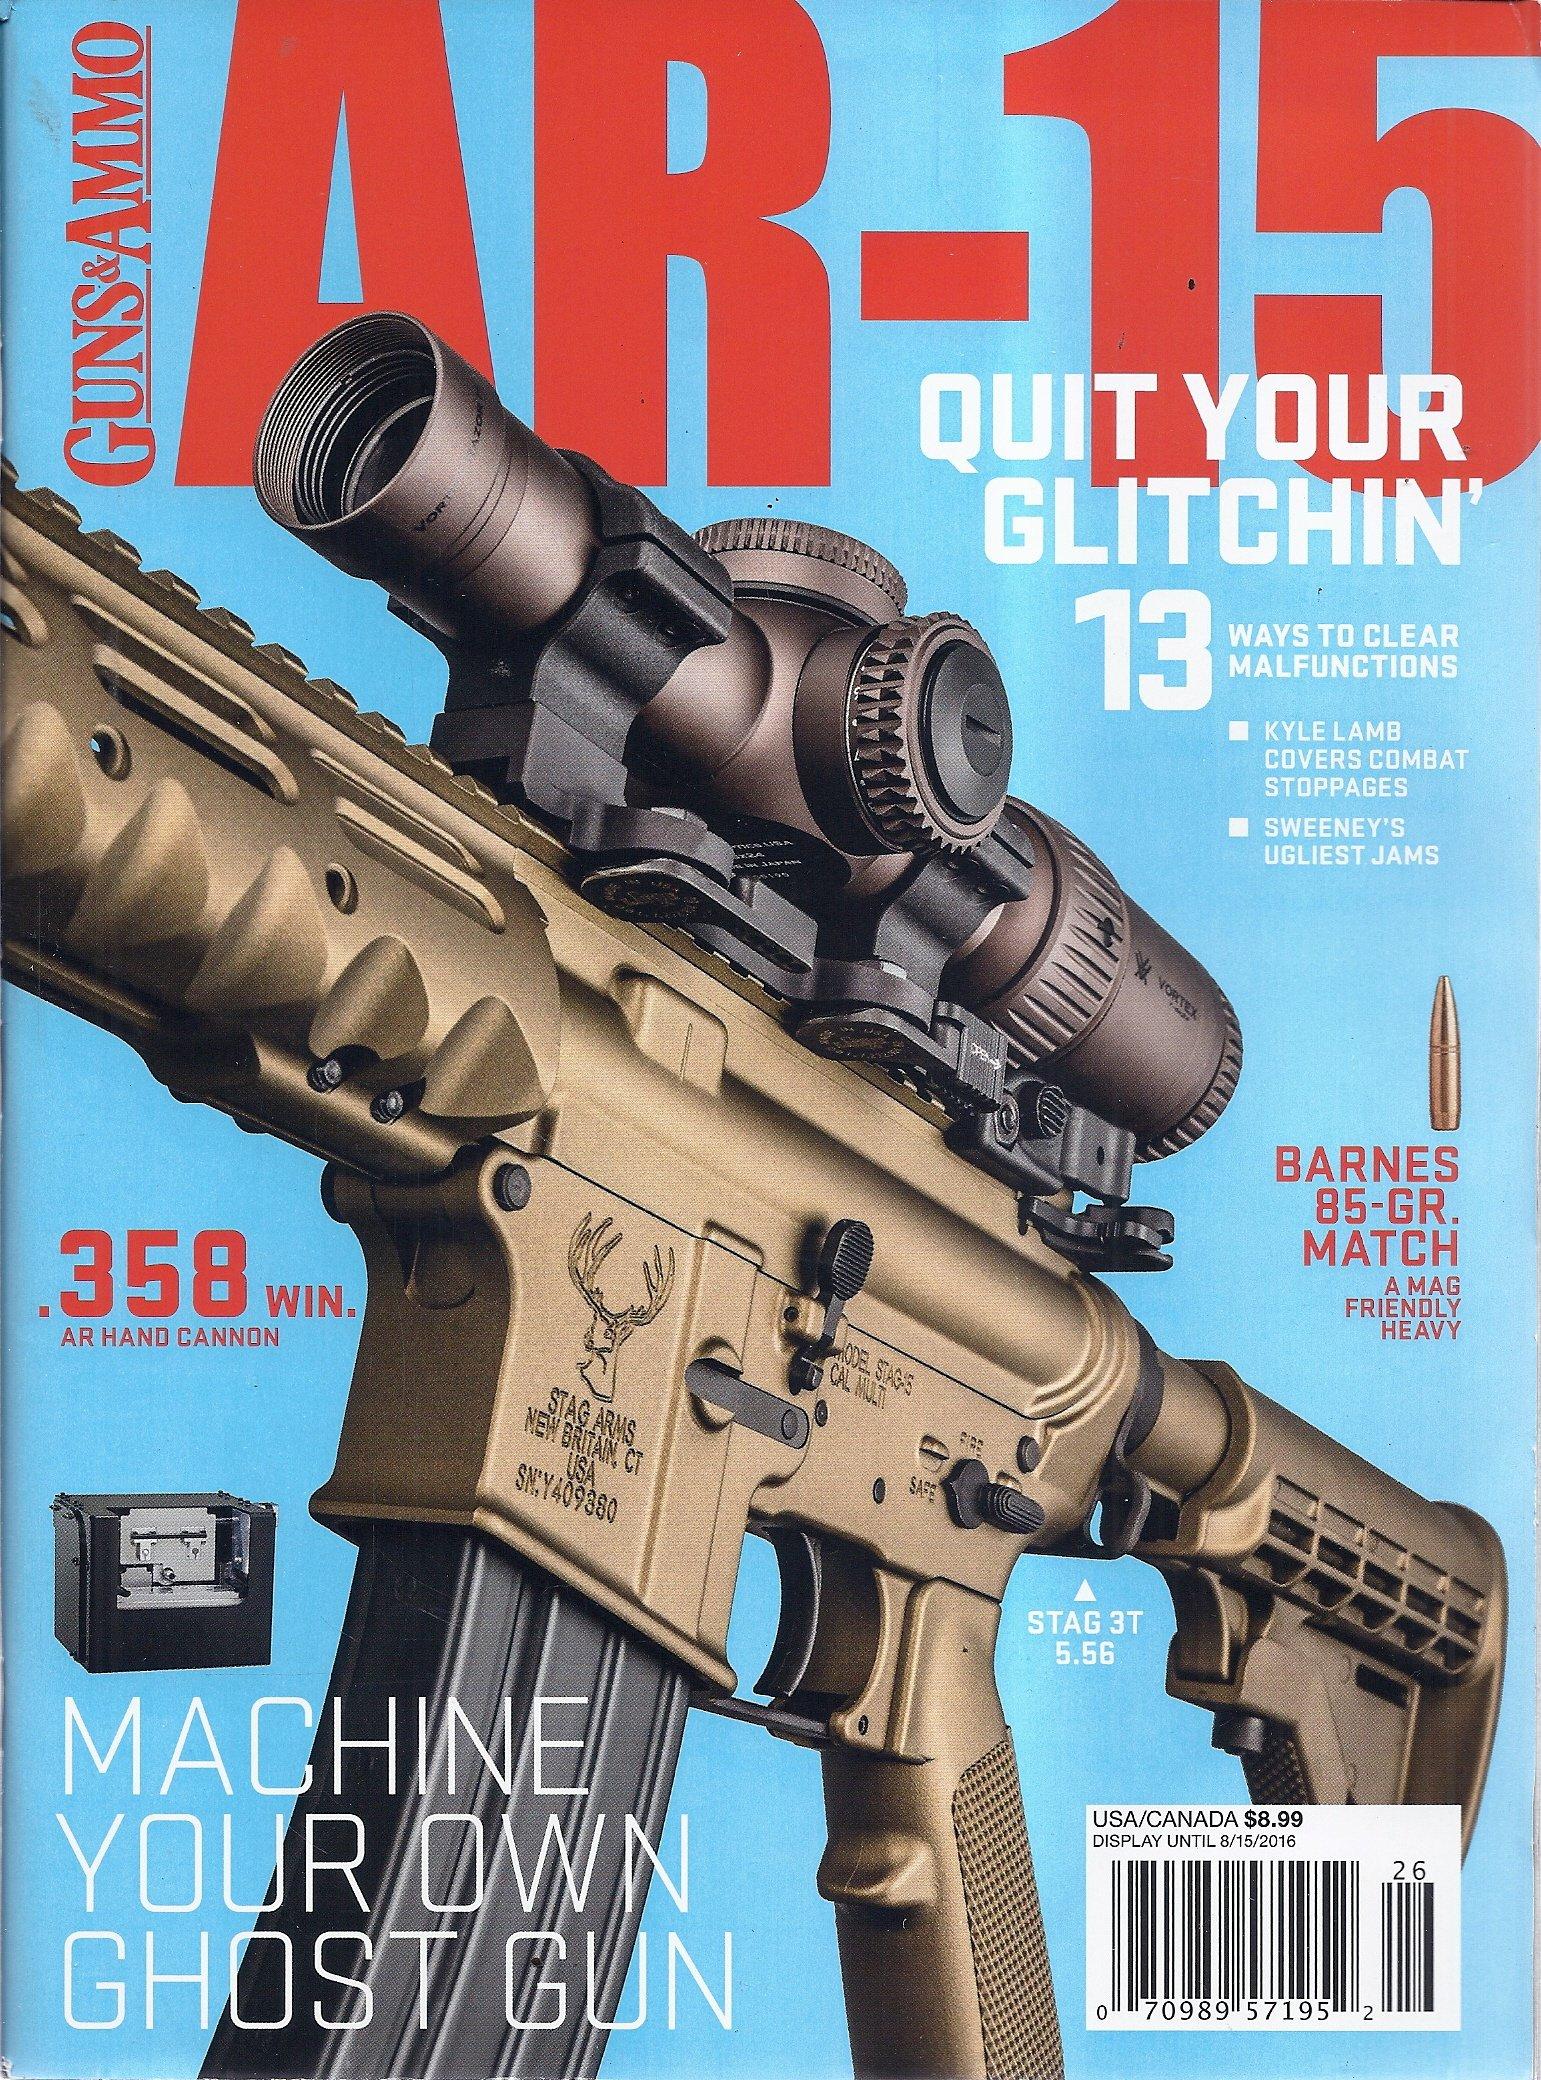 Download Guns & Ammo AR-15 Magazine (Stag 3T 5.56) pdf